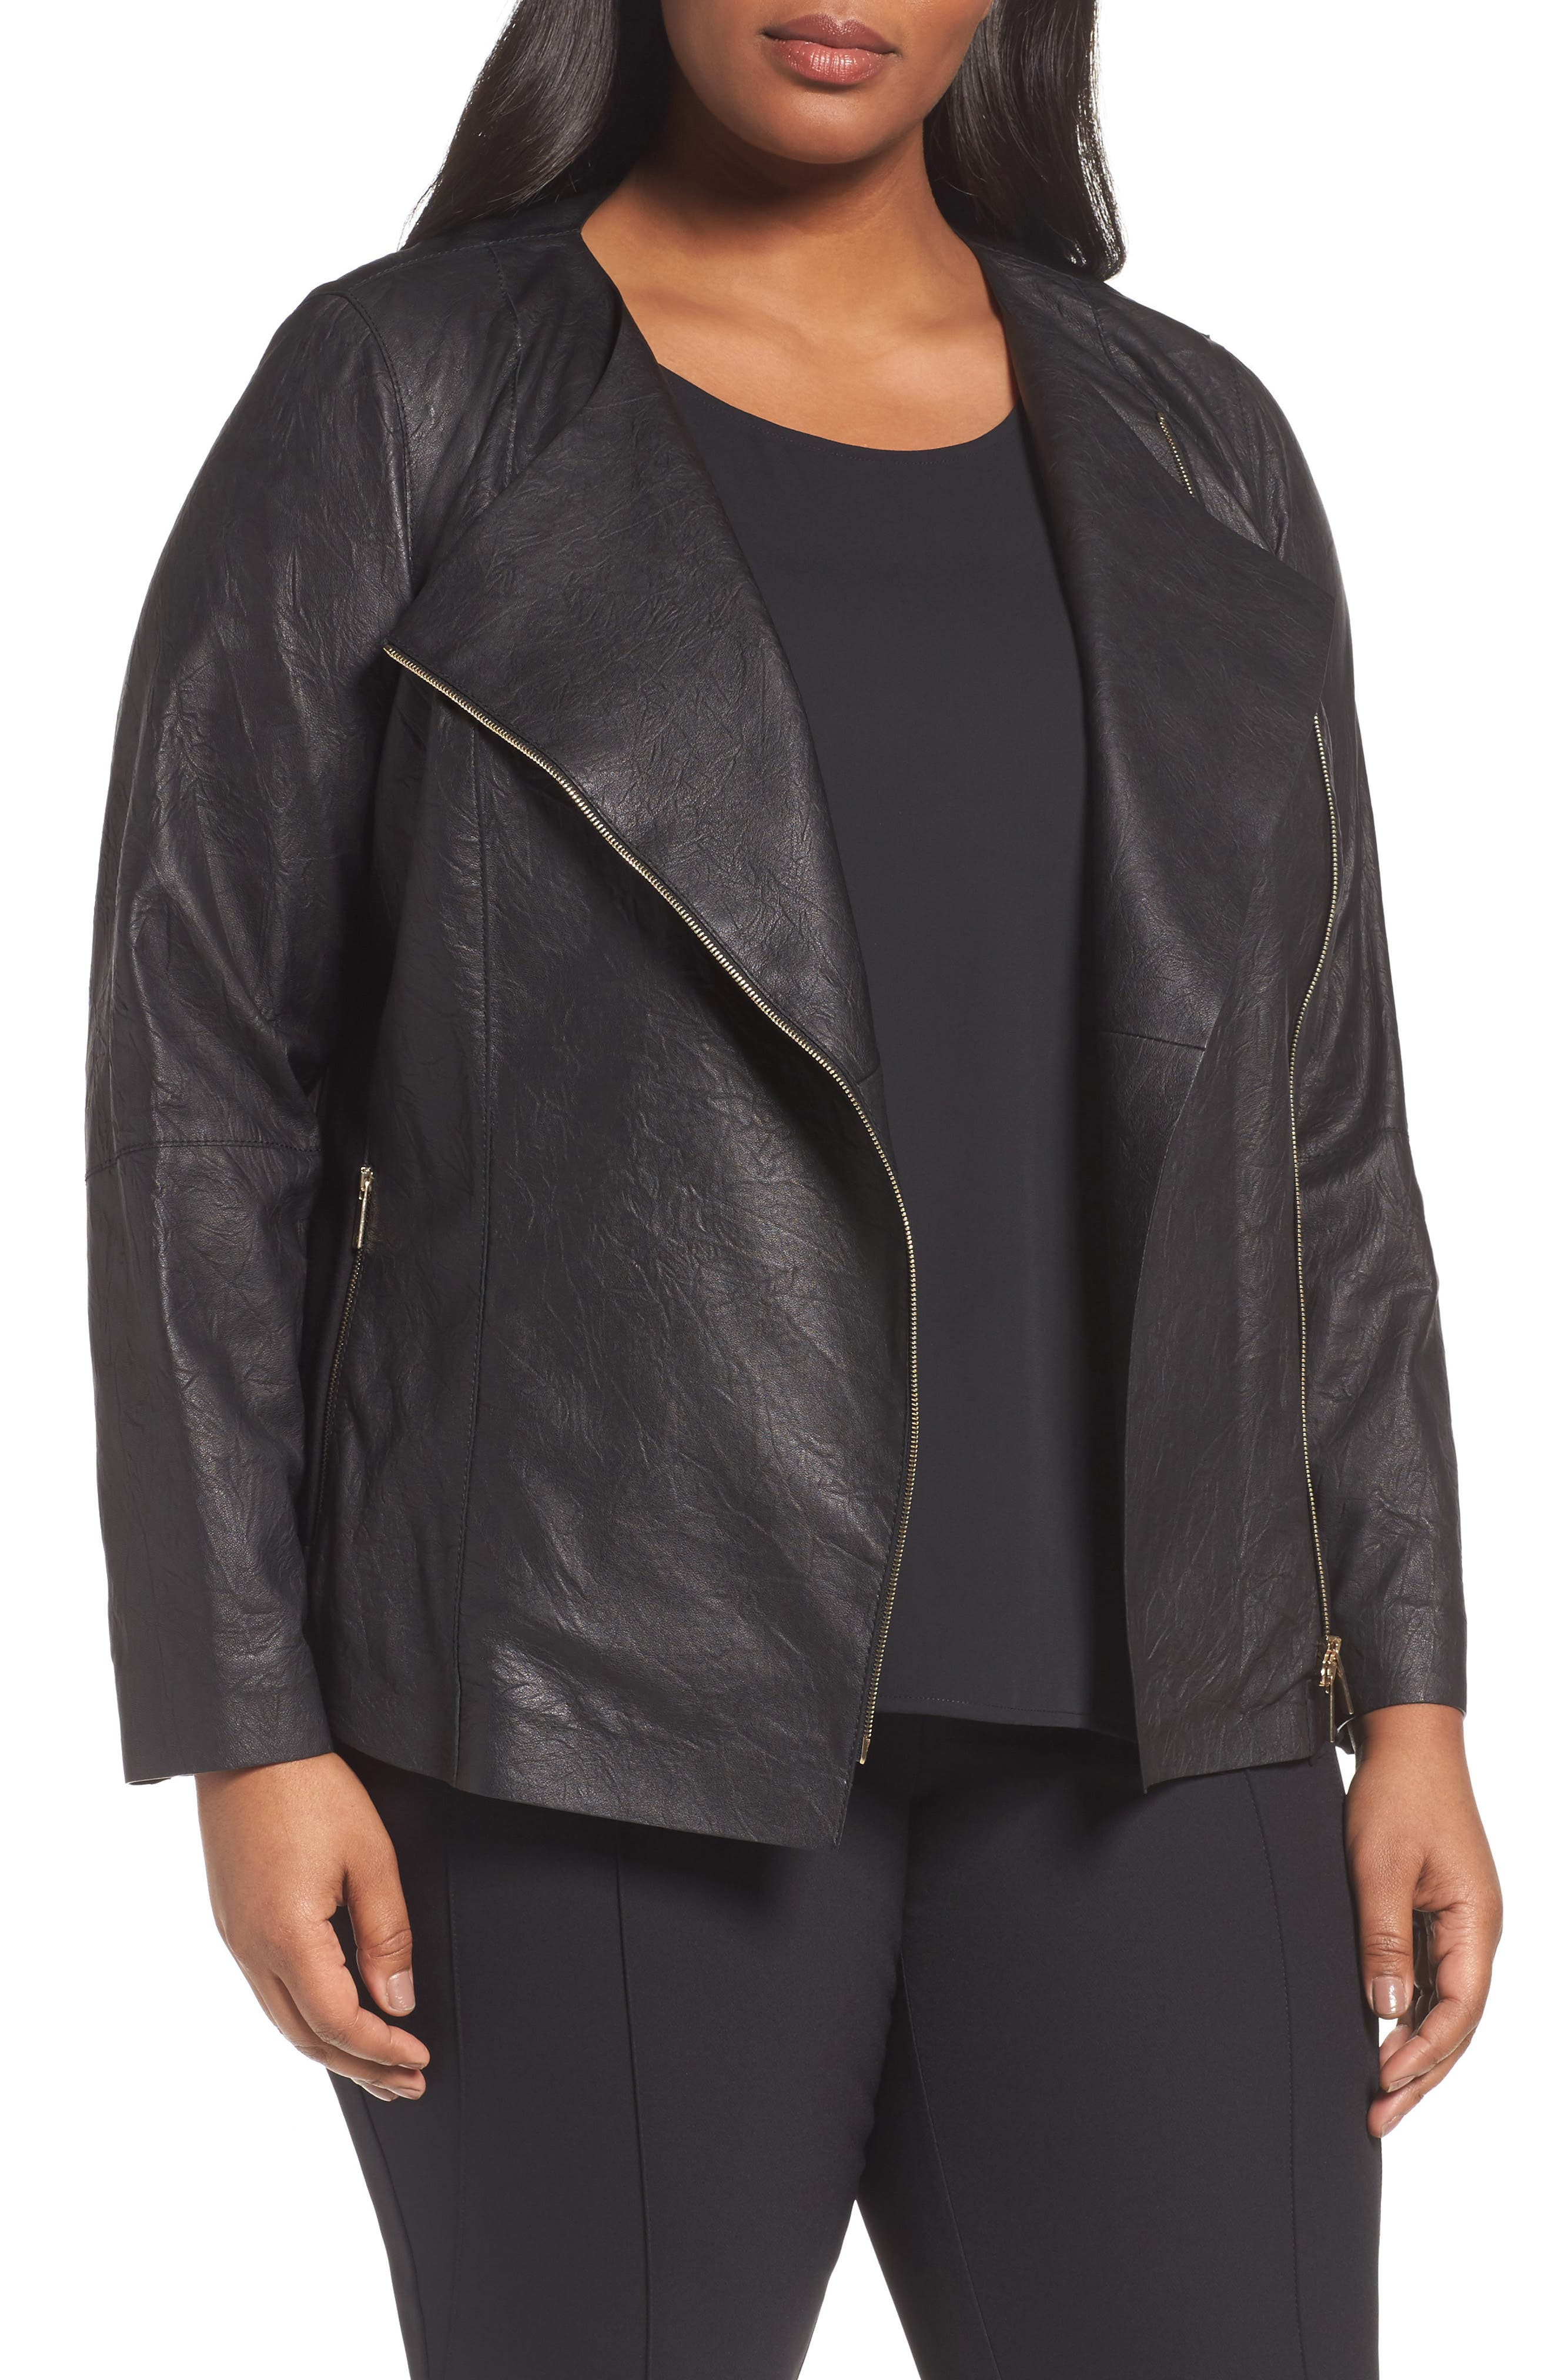 Aimes Leather Jacket,                         Main,                         color, Black